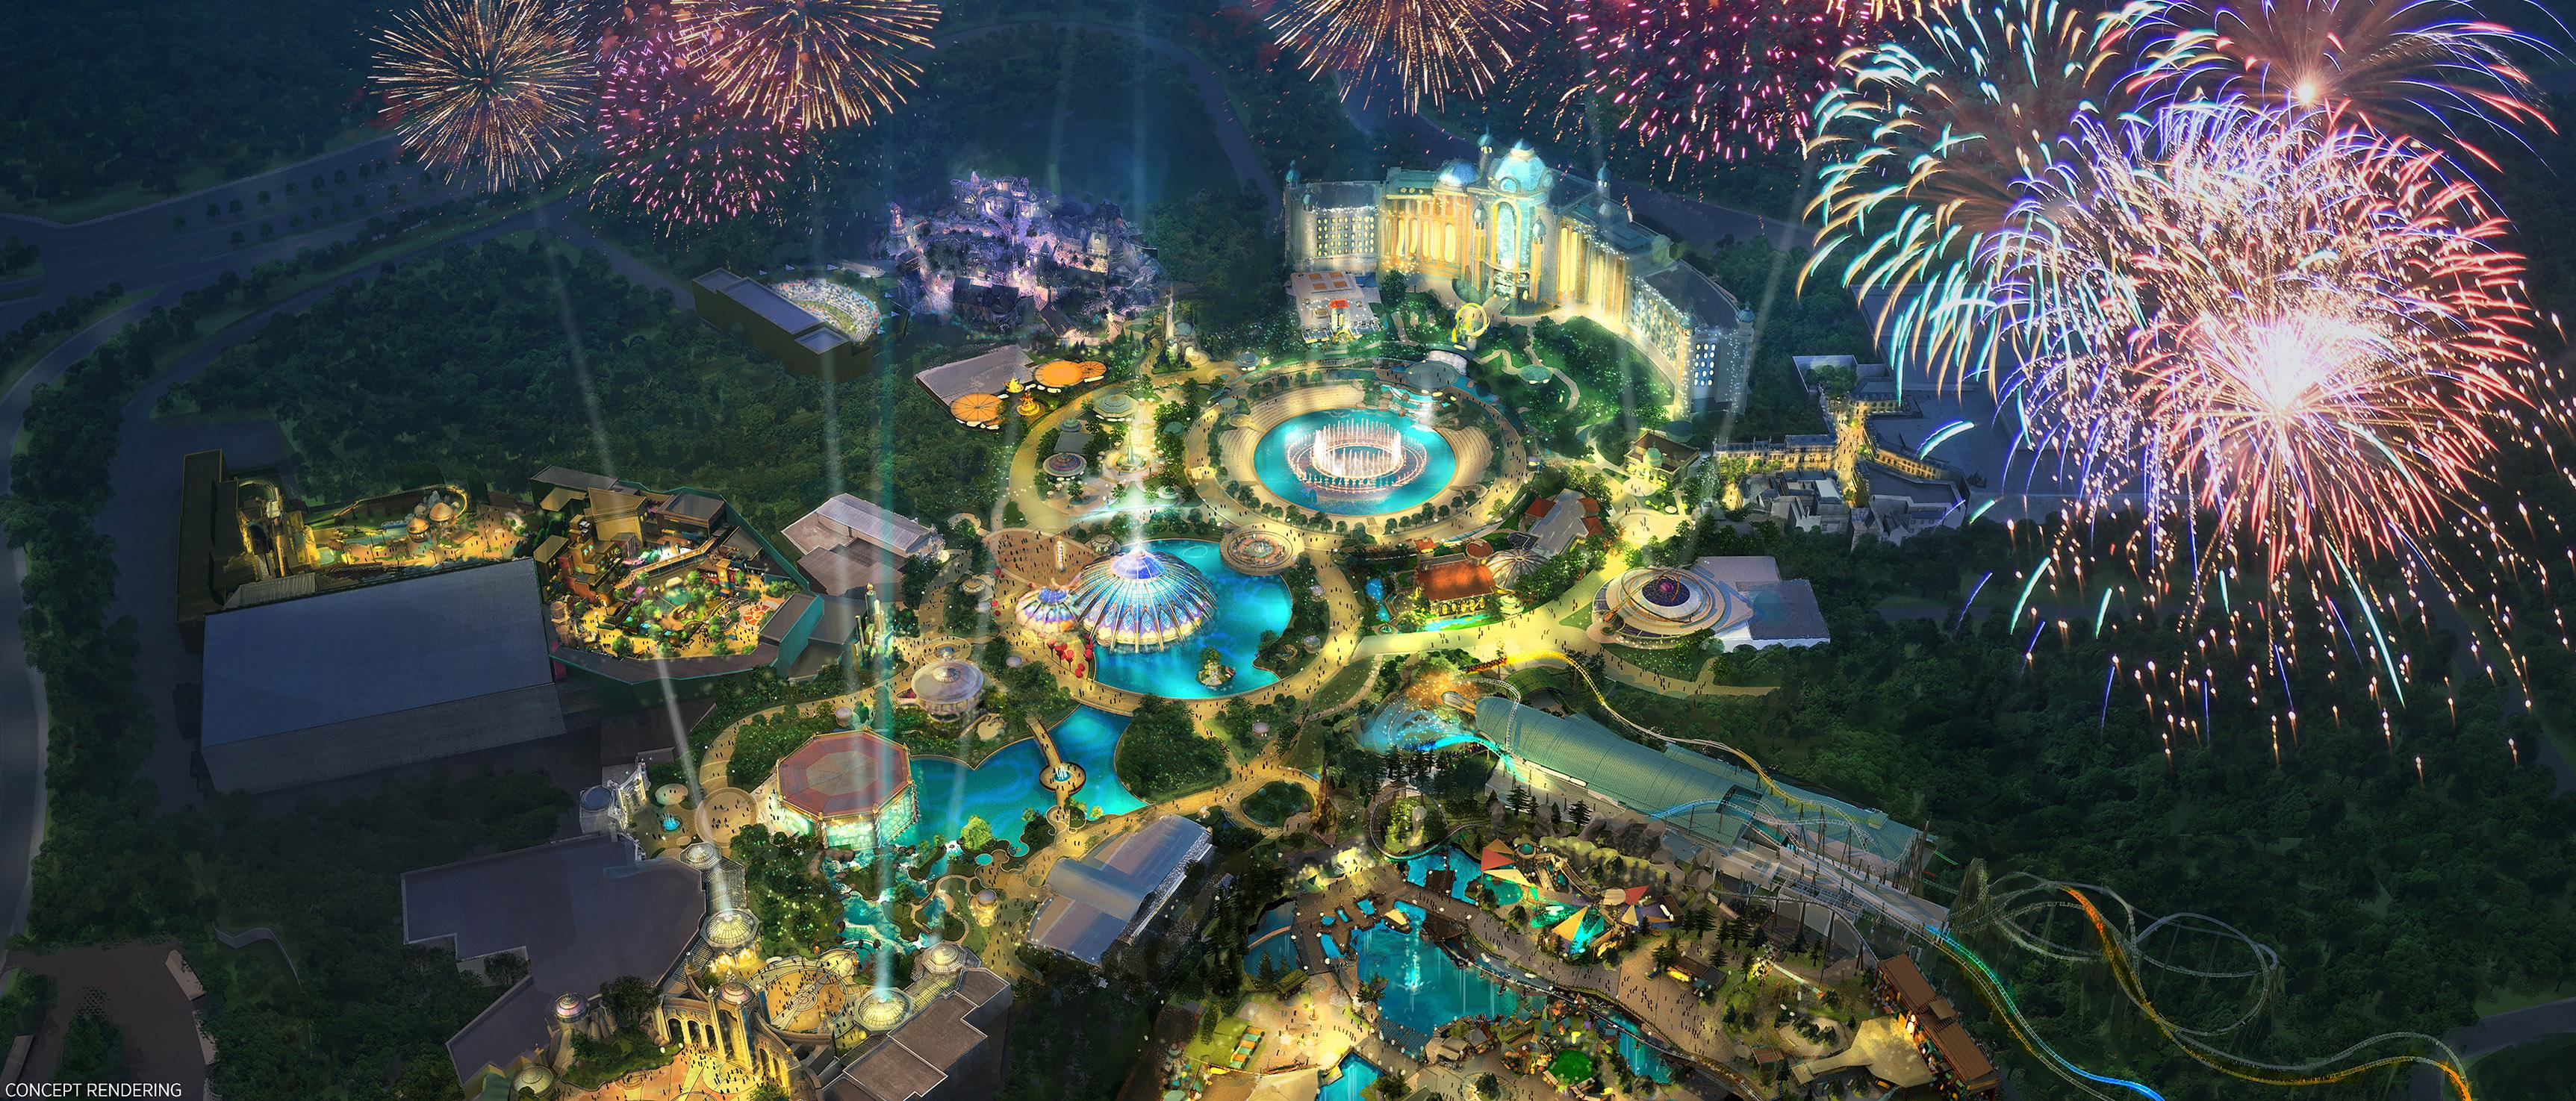 Universal Orlando Resort Announces Fourth Theme Park